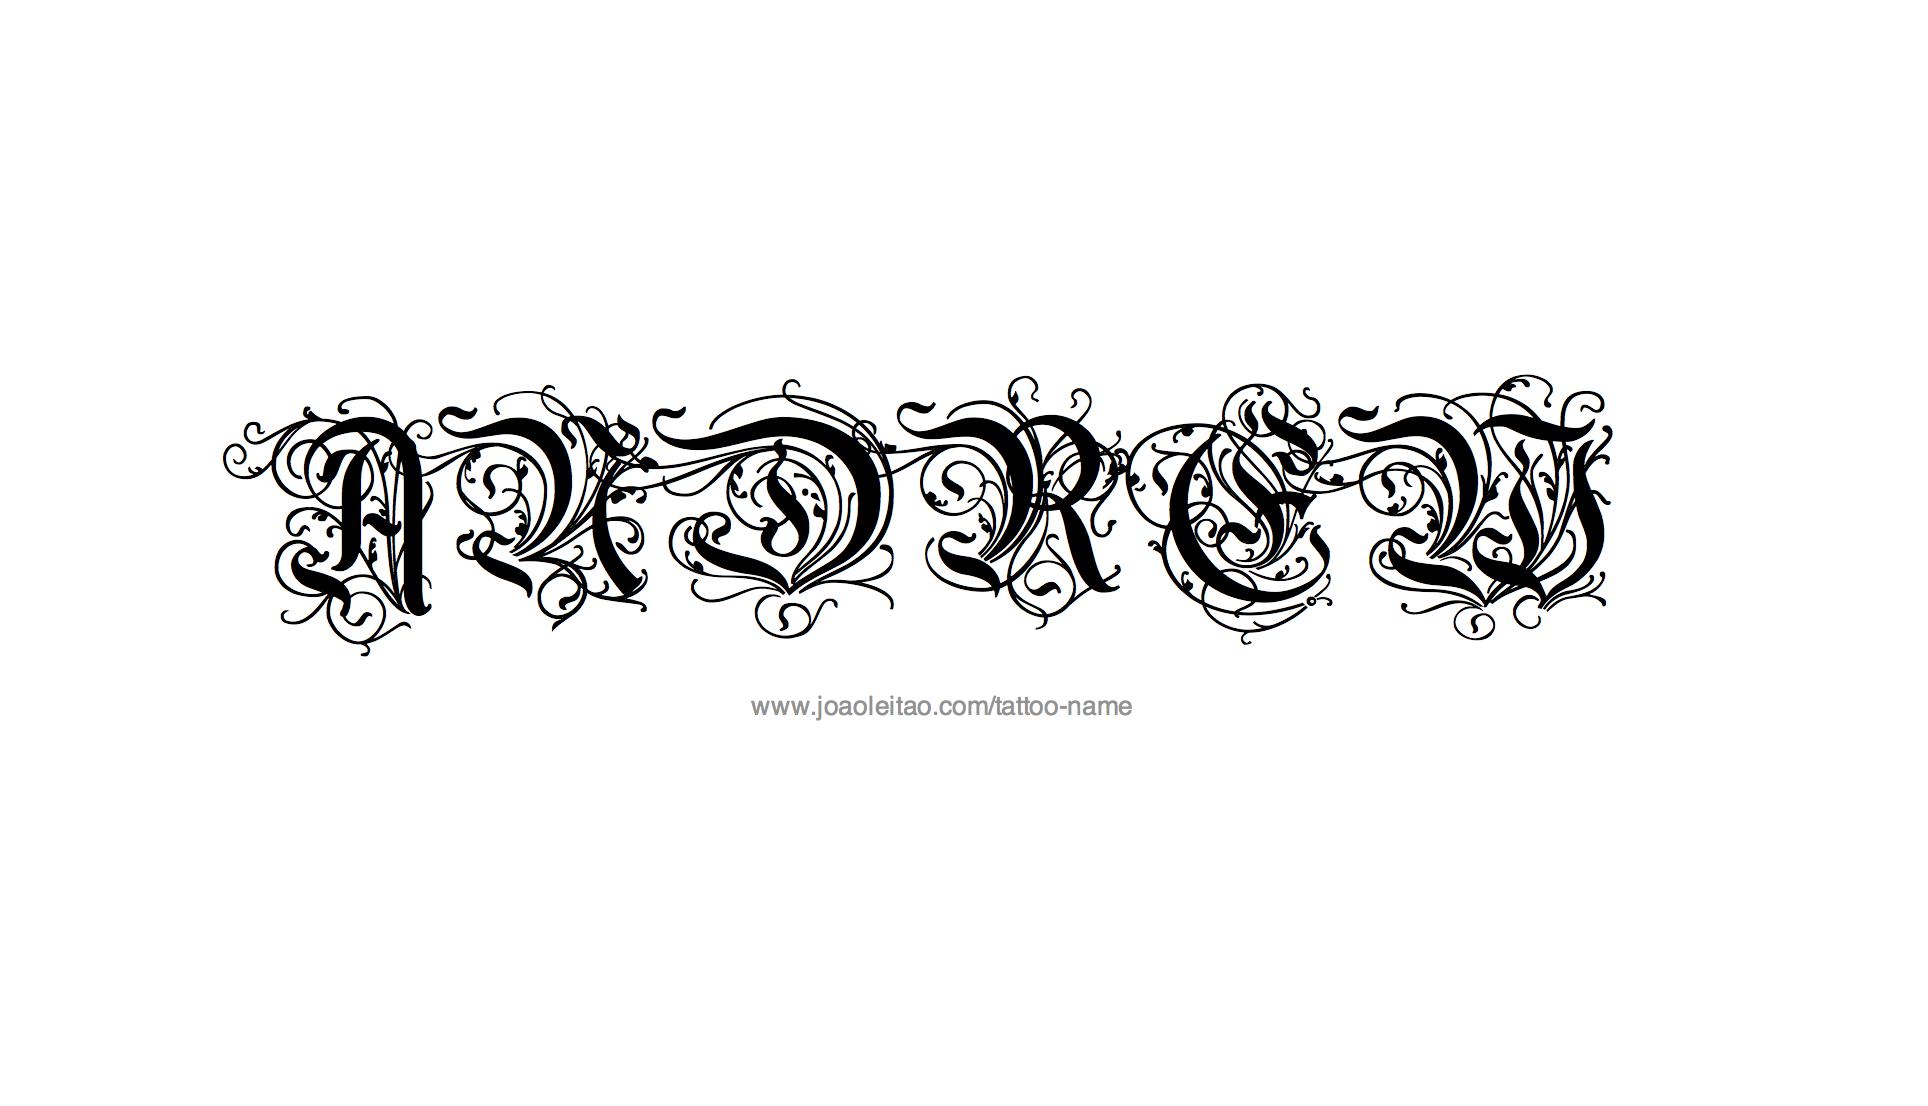 Name tattoo designs free - Name Tattoo Designs Free 37